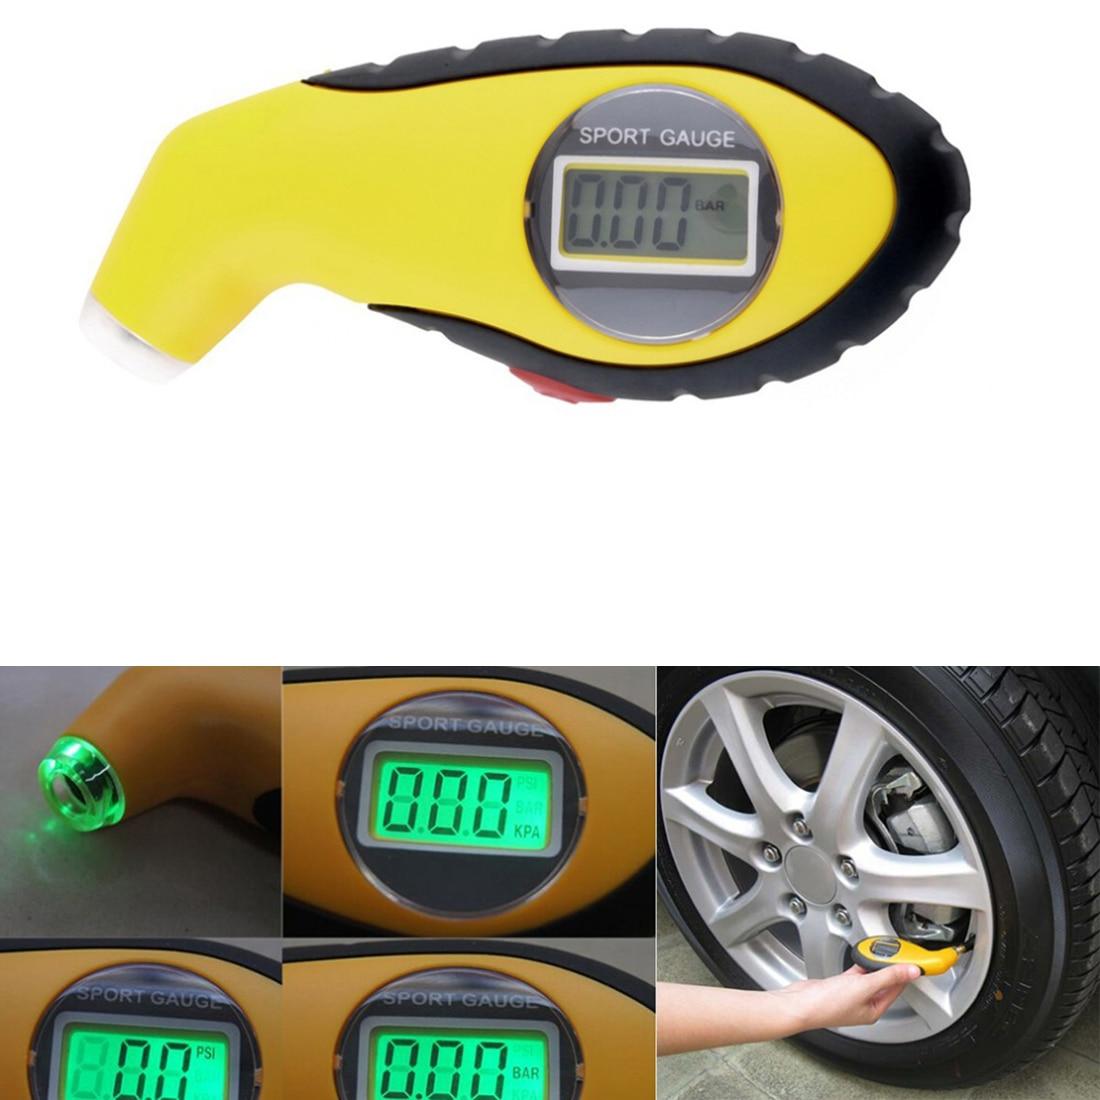 Good 1pcs New PSI Digital Tire Tyre Air Pressure Gauge Tester Tool For Auto Car Motorcycle PSI  KPA BAR